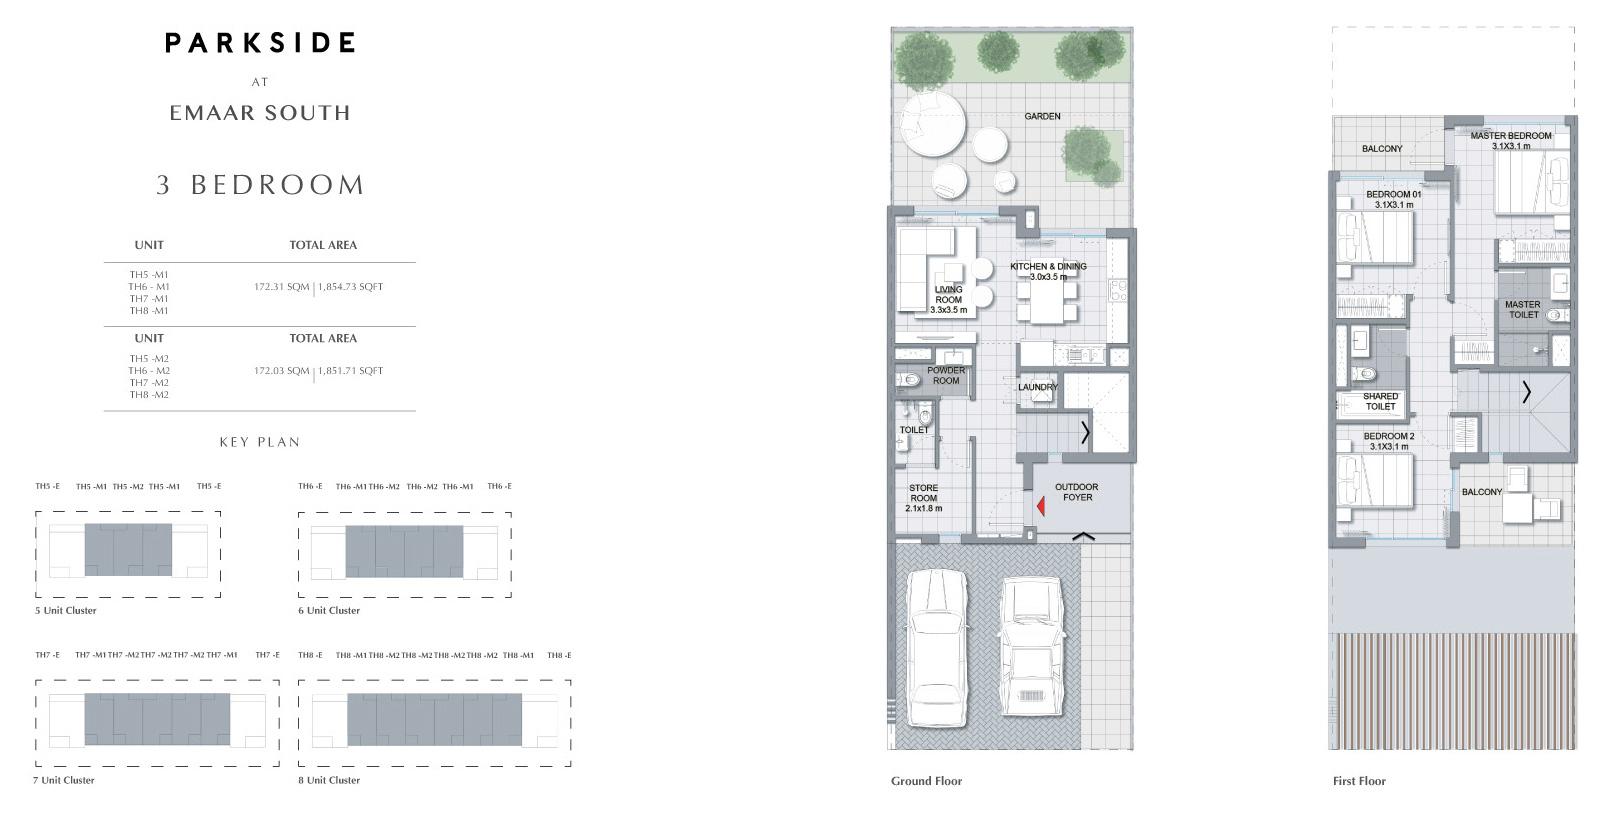 3 Bedroom  Size 1854.73 sq.ft